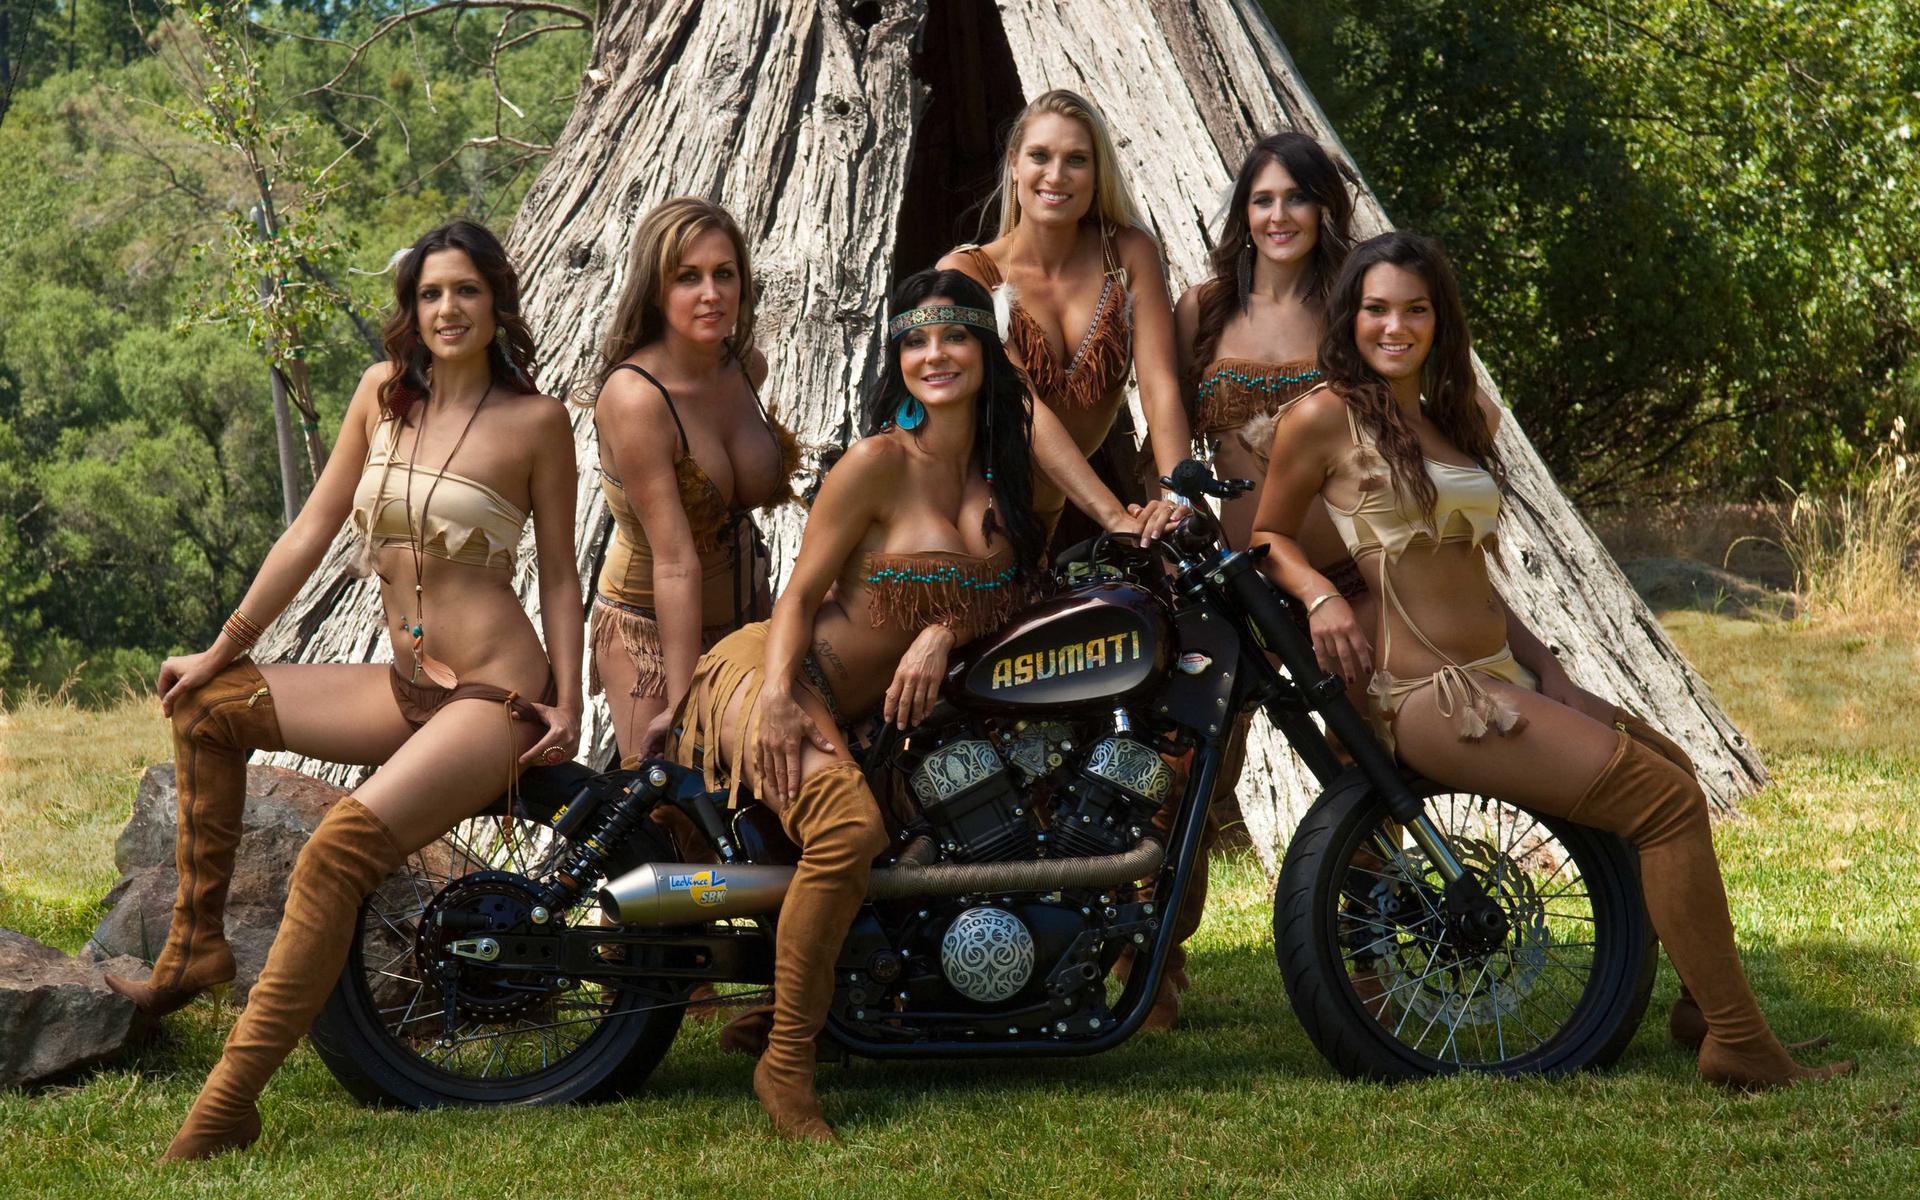 Amateur naked biker women pics